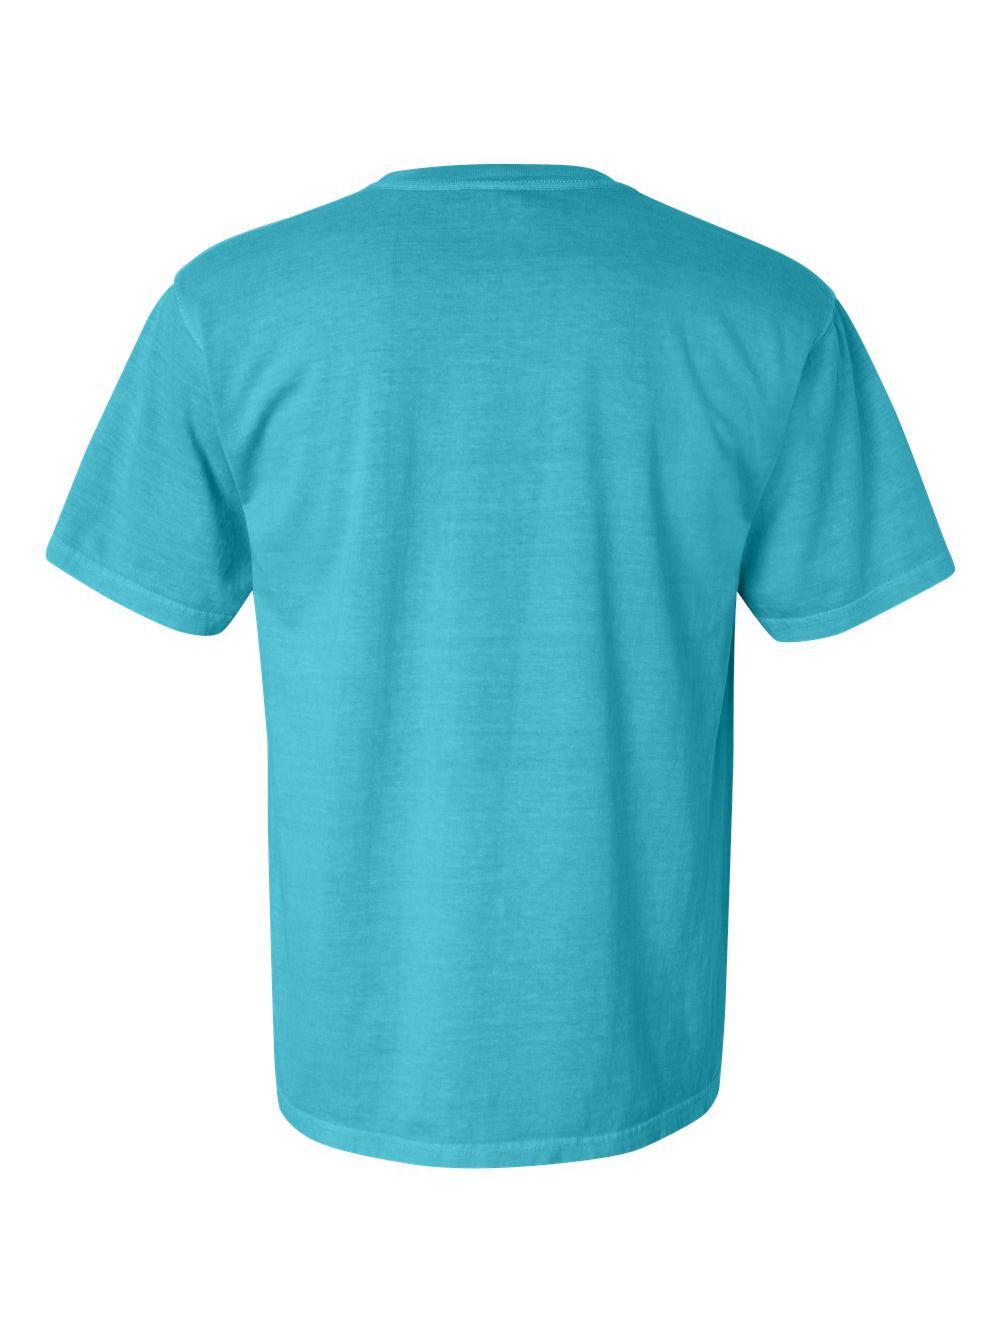 Comfort-Colors-Garment-Dyed-Heavyweight-Ringspun-Short-Sleeve-Shirt-1717 thumbnail 79